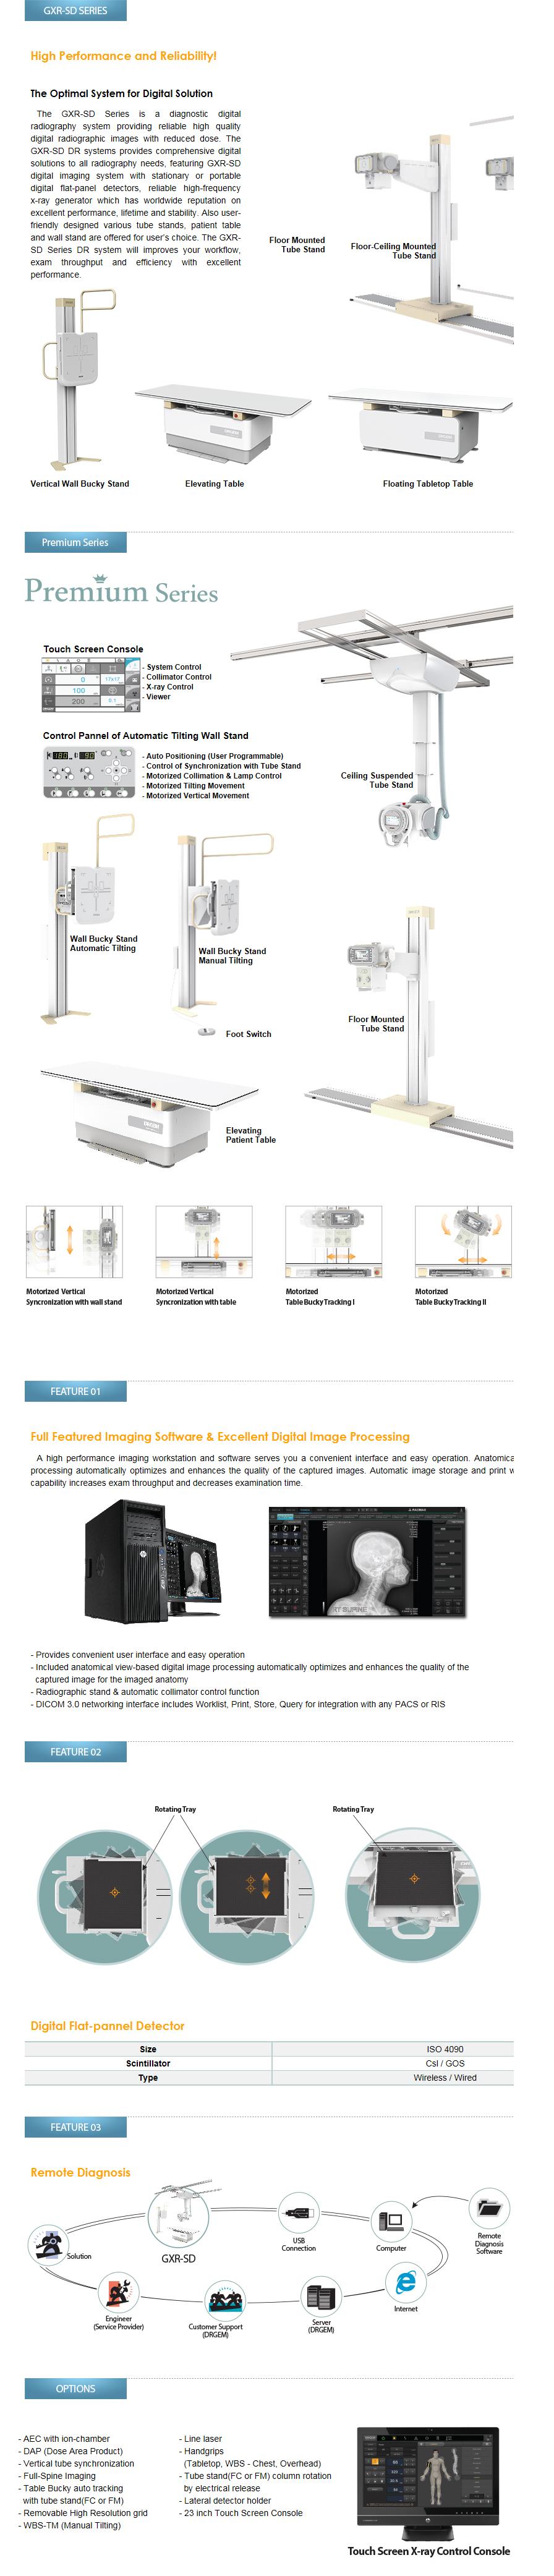 DRGEM Digital Radiography System GXR-SD Series